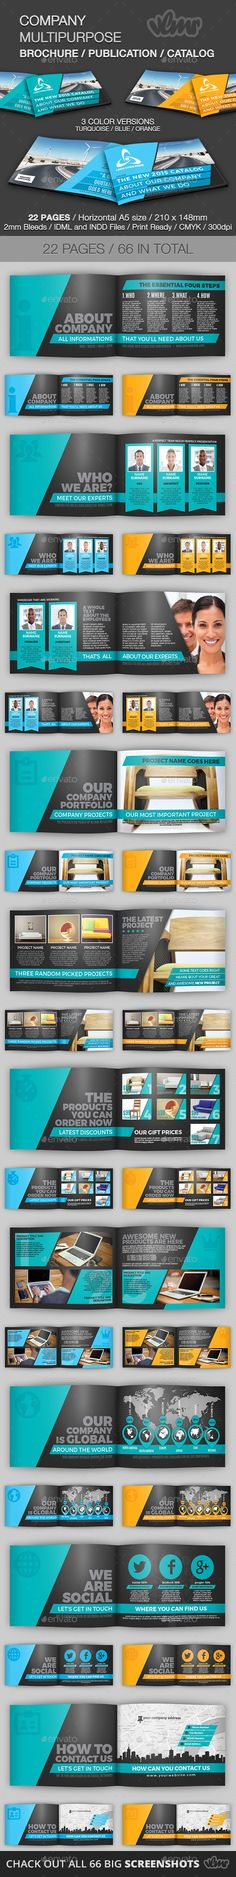 Company Multipurpose Brochure Template #design Download: http://graphicriver.net/item/company-multipurpose-brochure-template/11478675?ref=ksioks